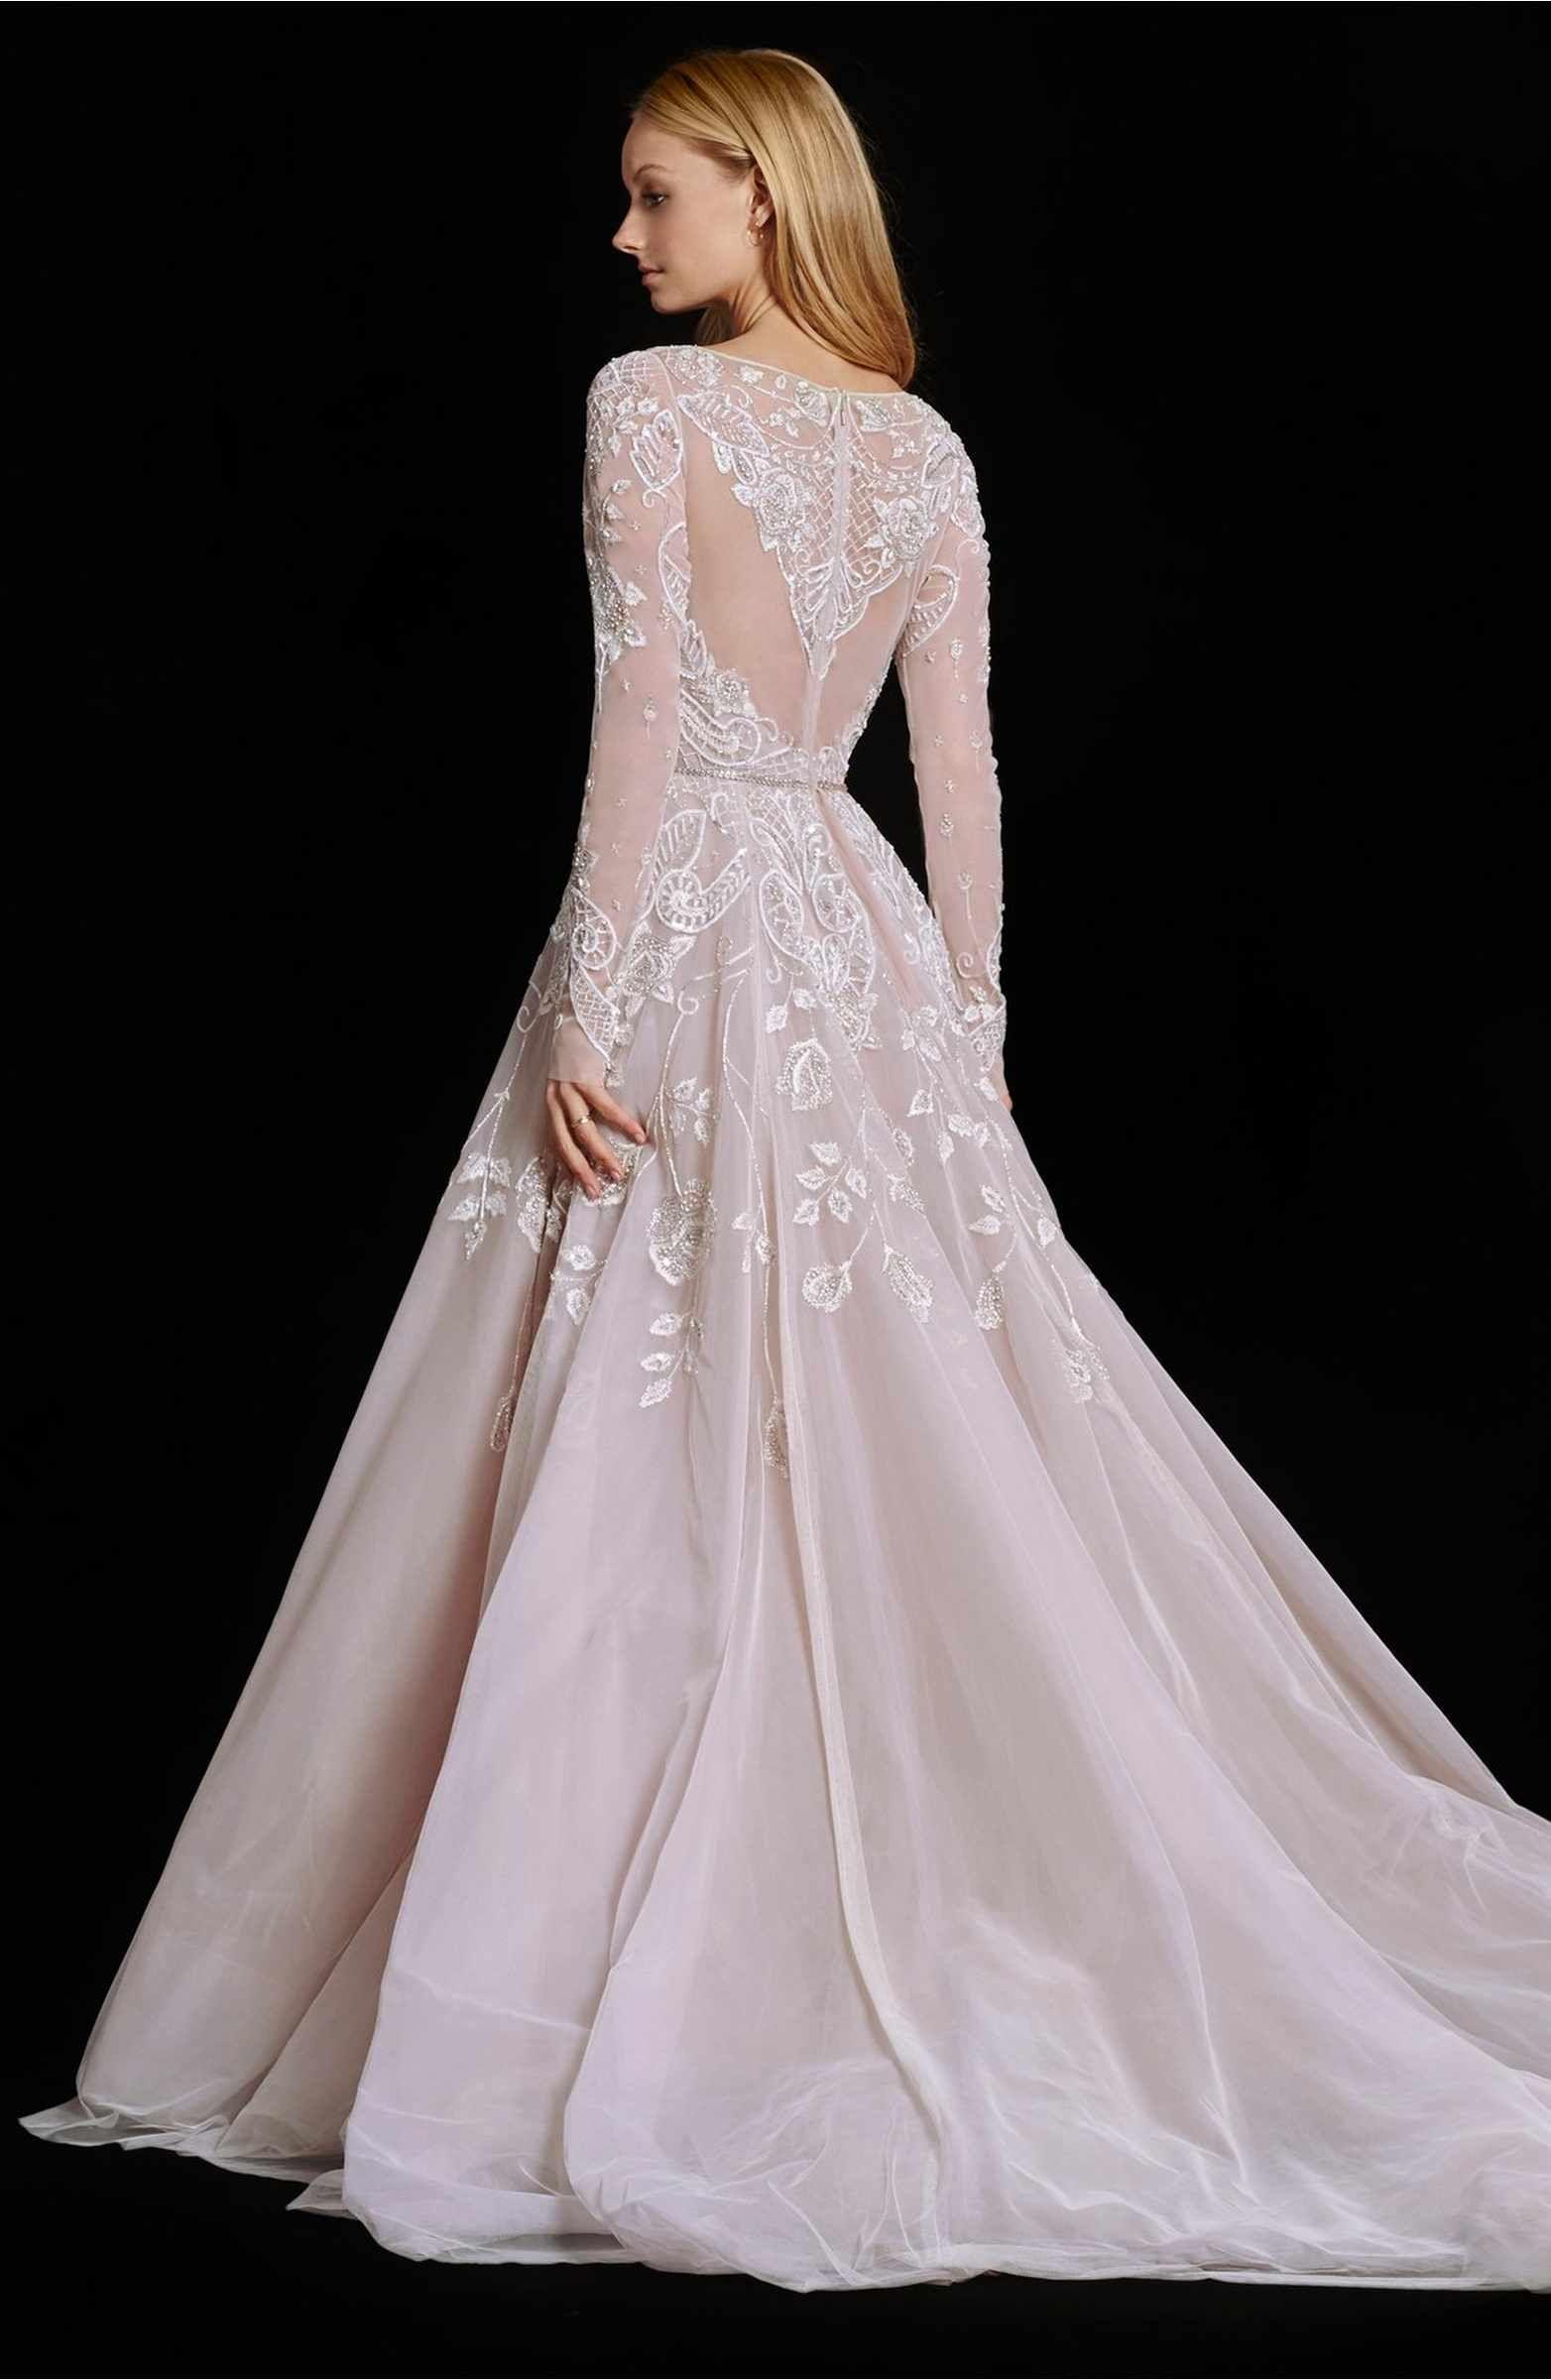 99c72e6ffad7 Hayley Paige Hayley Embellished English Net & Tulle Long Sleeve Ballgown,  $5,000